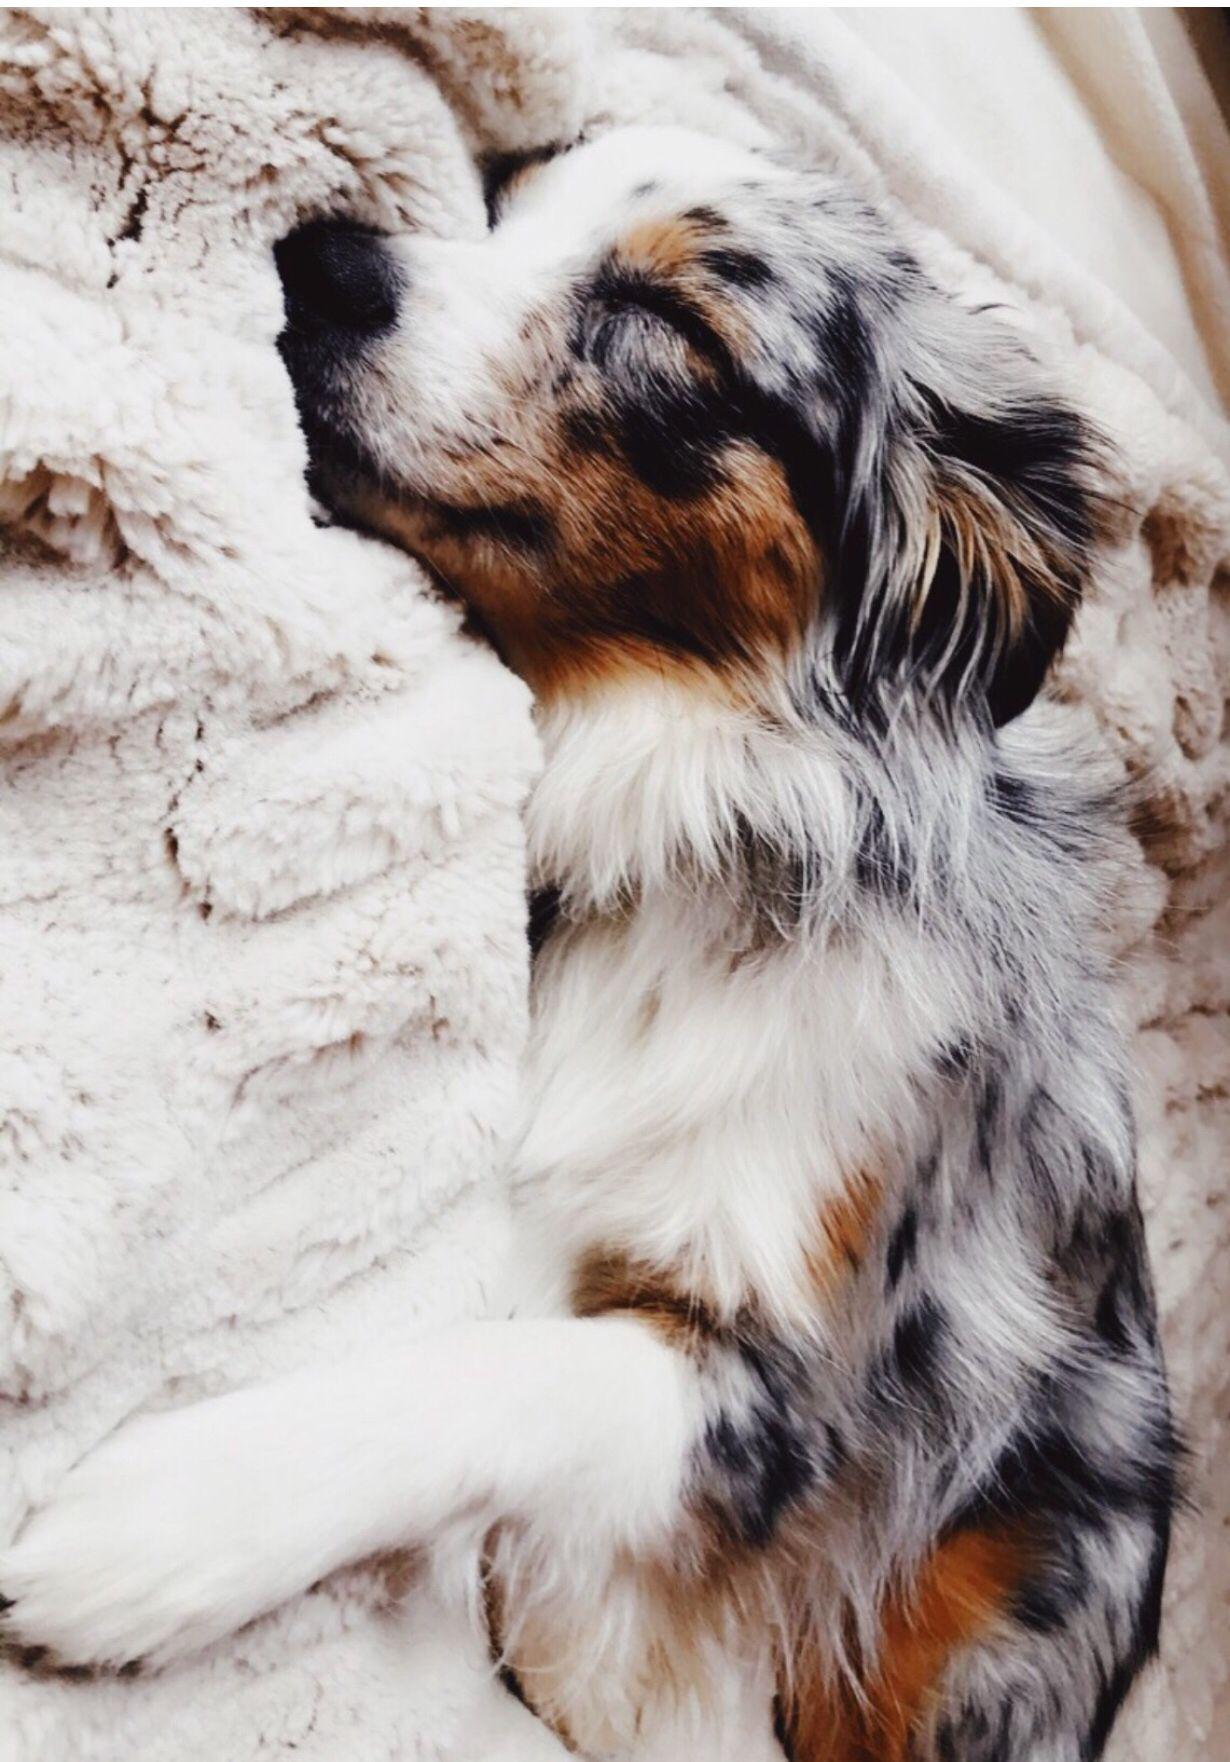 Pin By Sareena Yasmin On Cute Animals In 2020 Cute Animals Australian Shepherd Dogs Cute Dogs